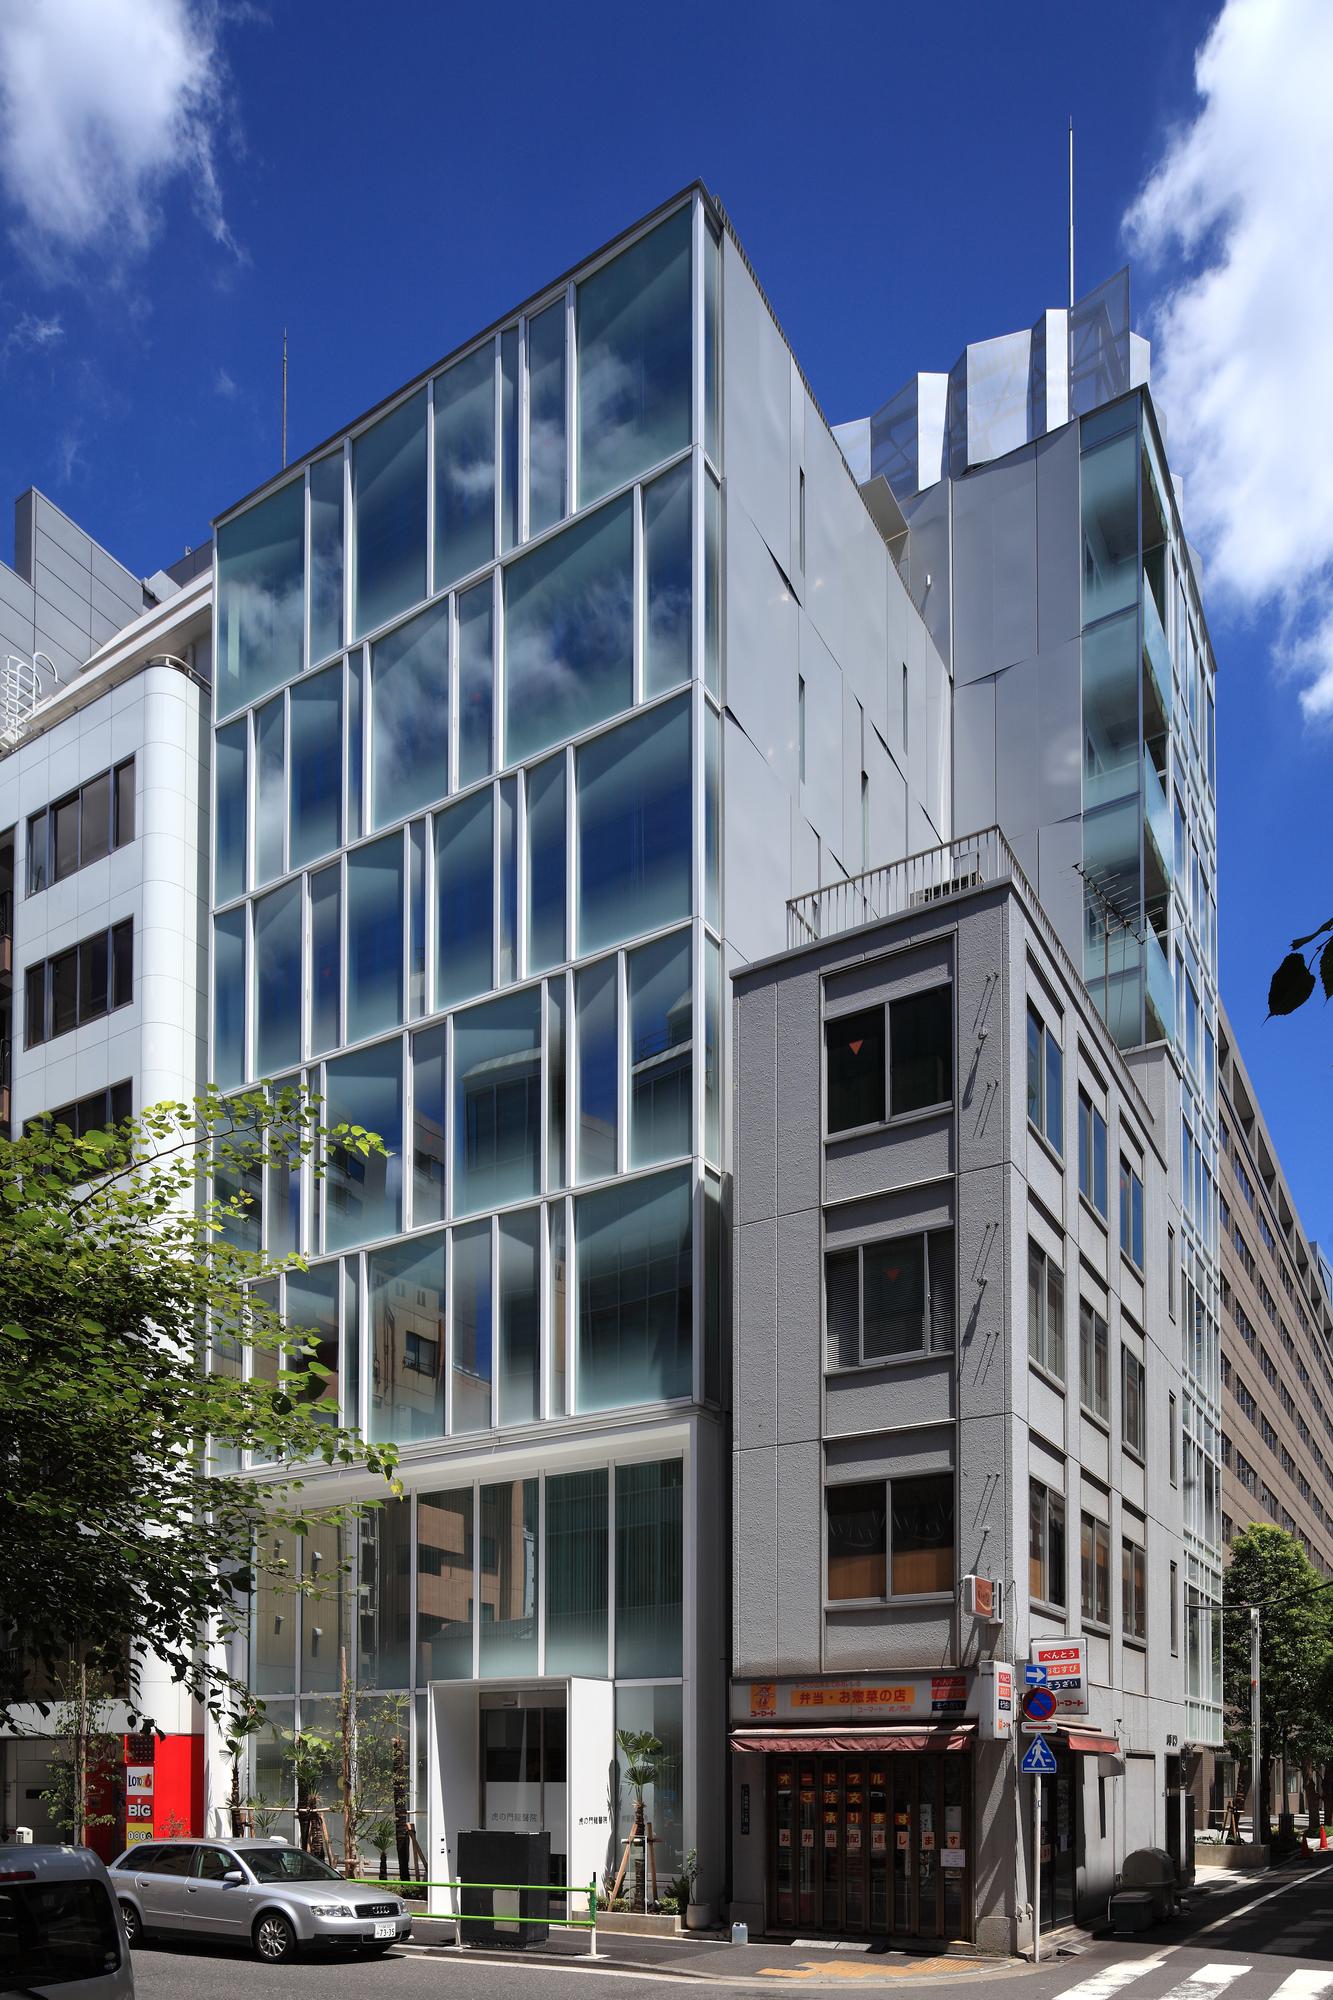 T.S.R.Building / Jun'ichi Ito Architect & Associates, © Naoomi Kurozumi